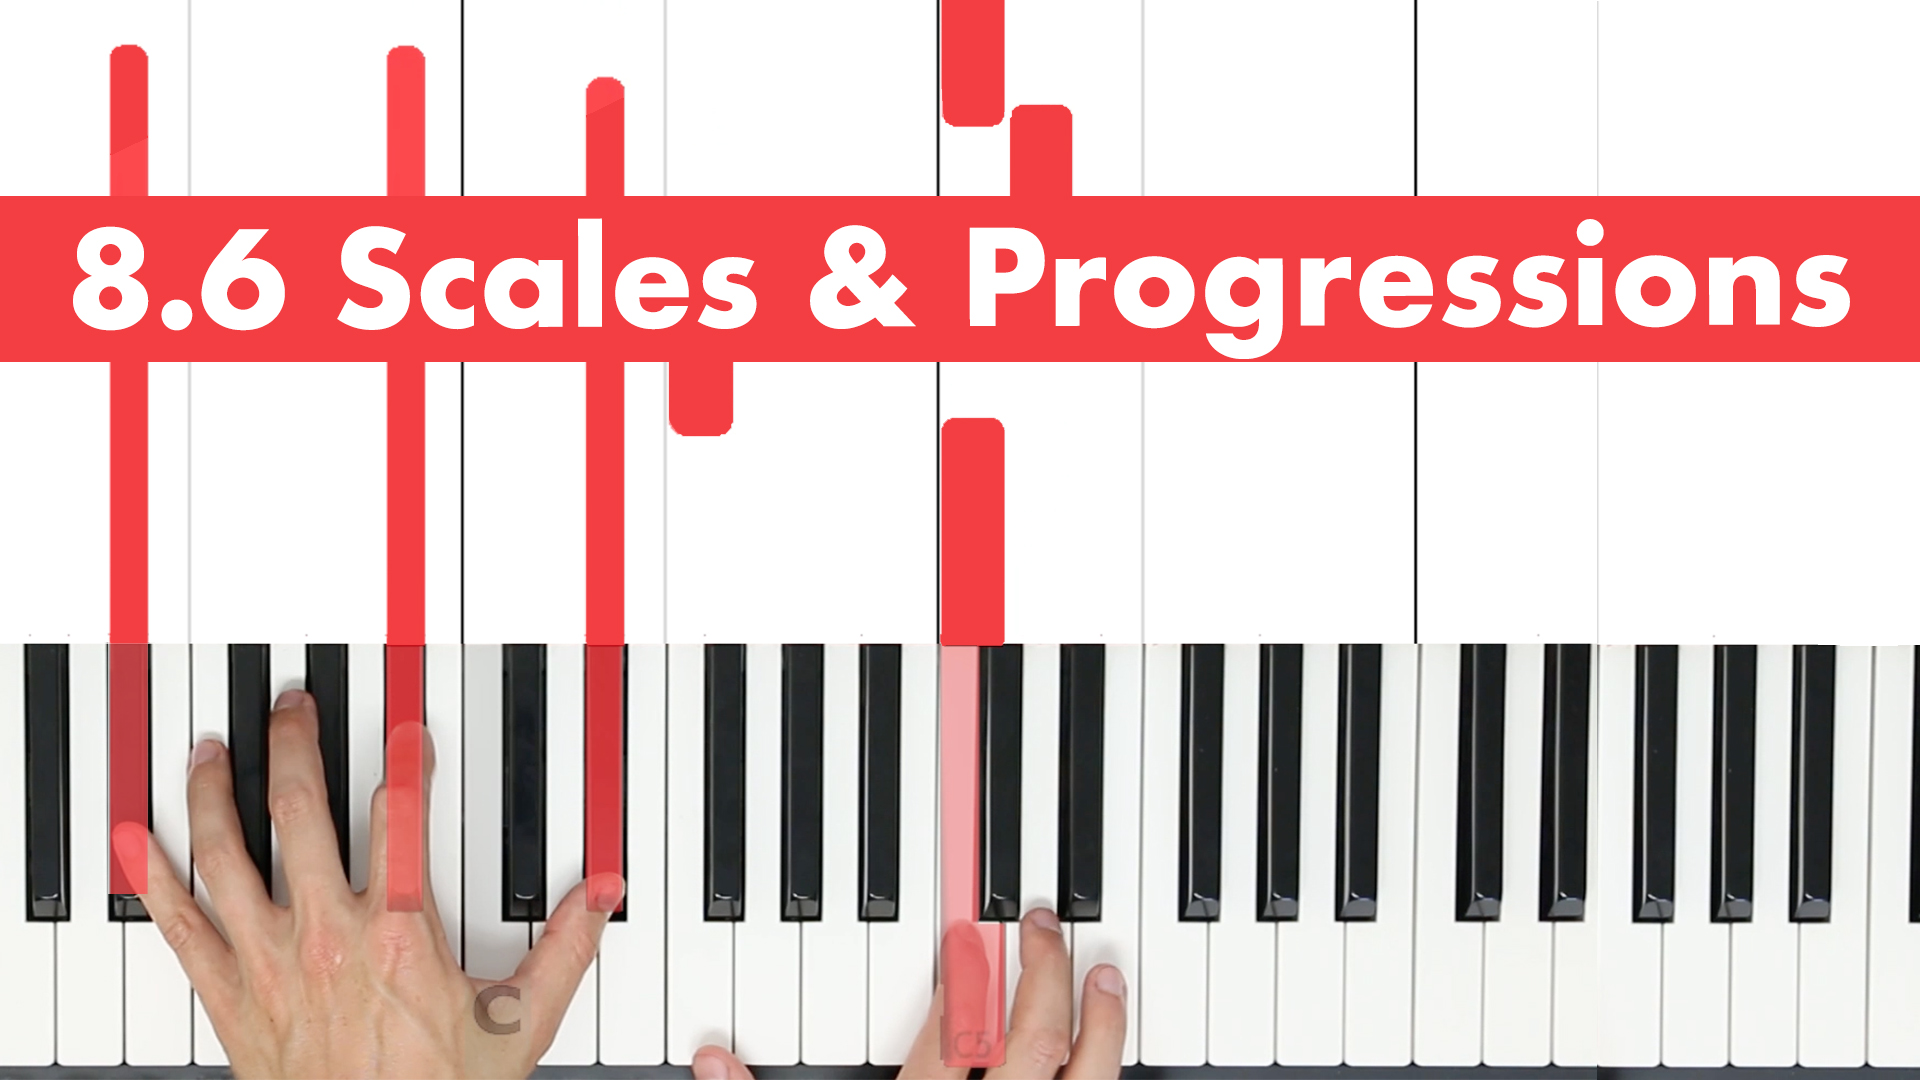 8.6 Scales & Progressions